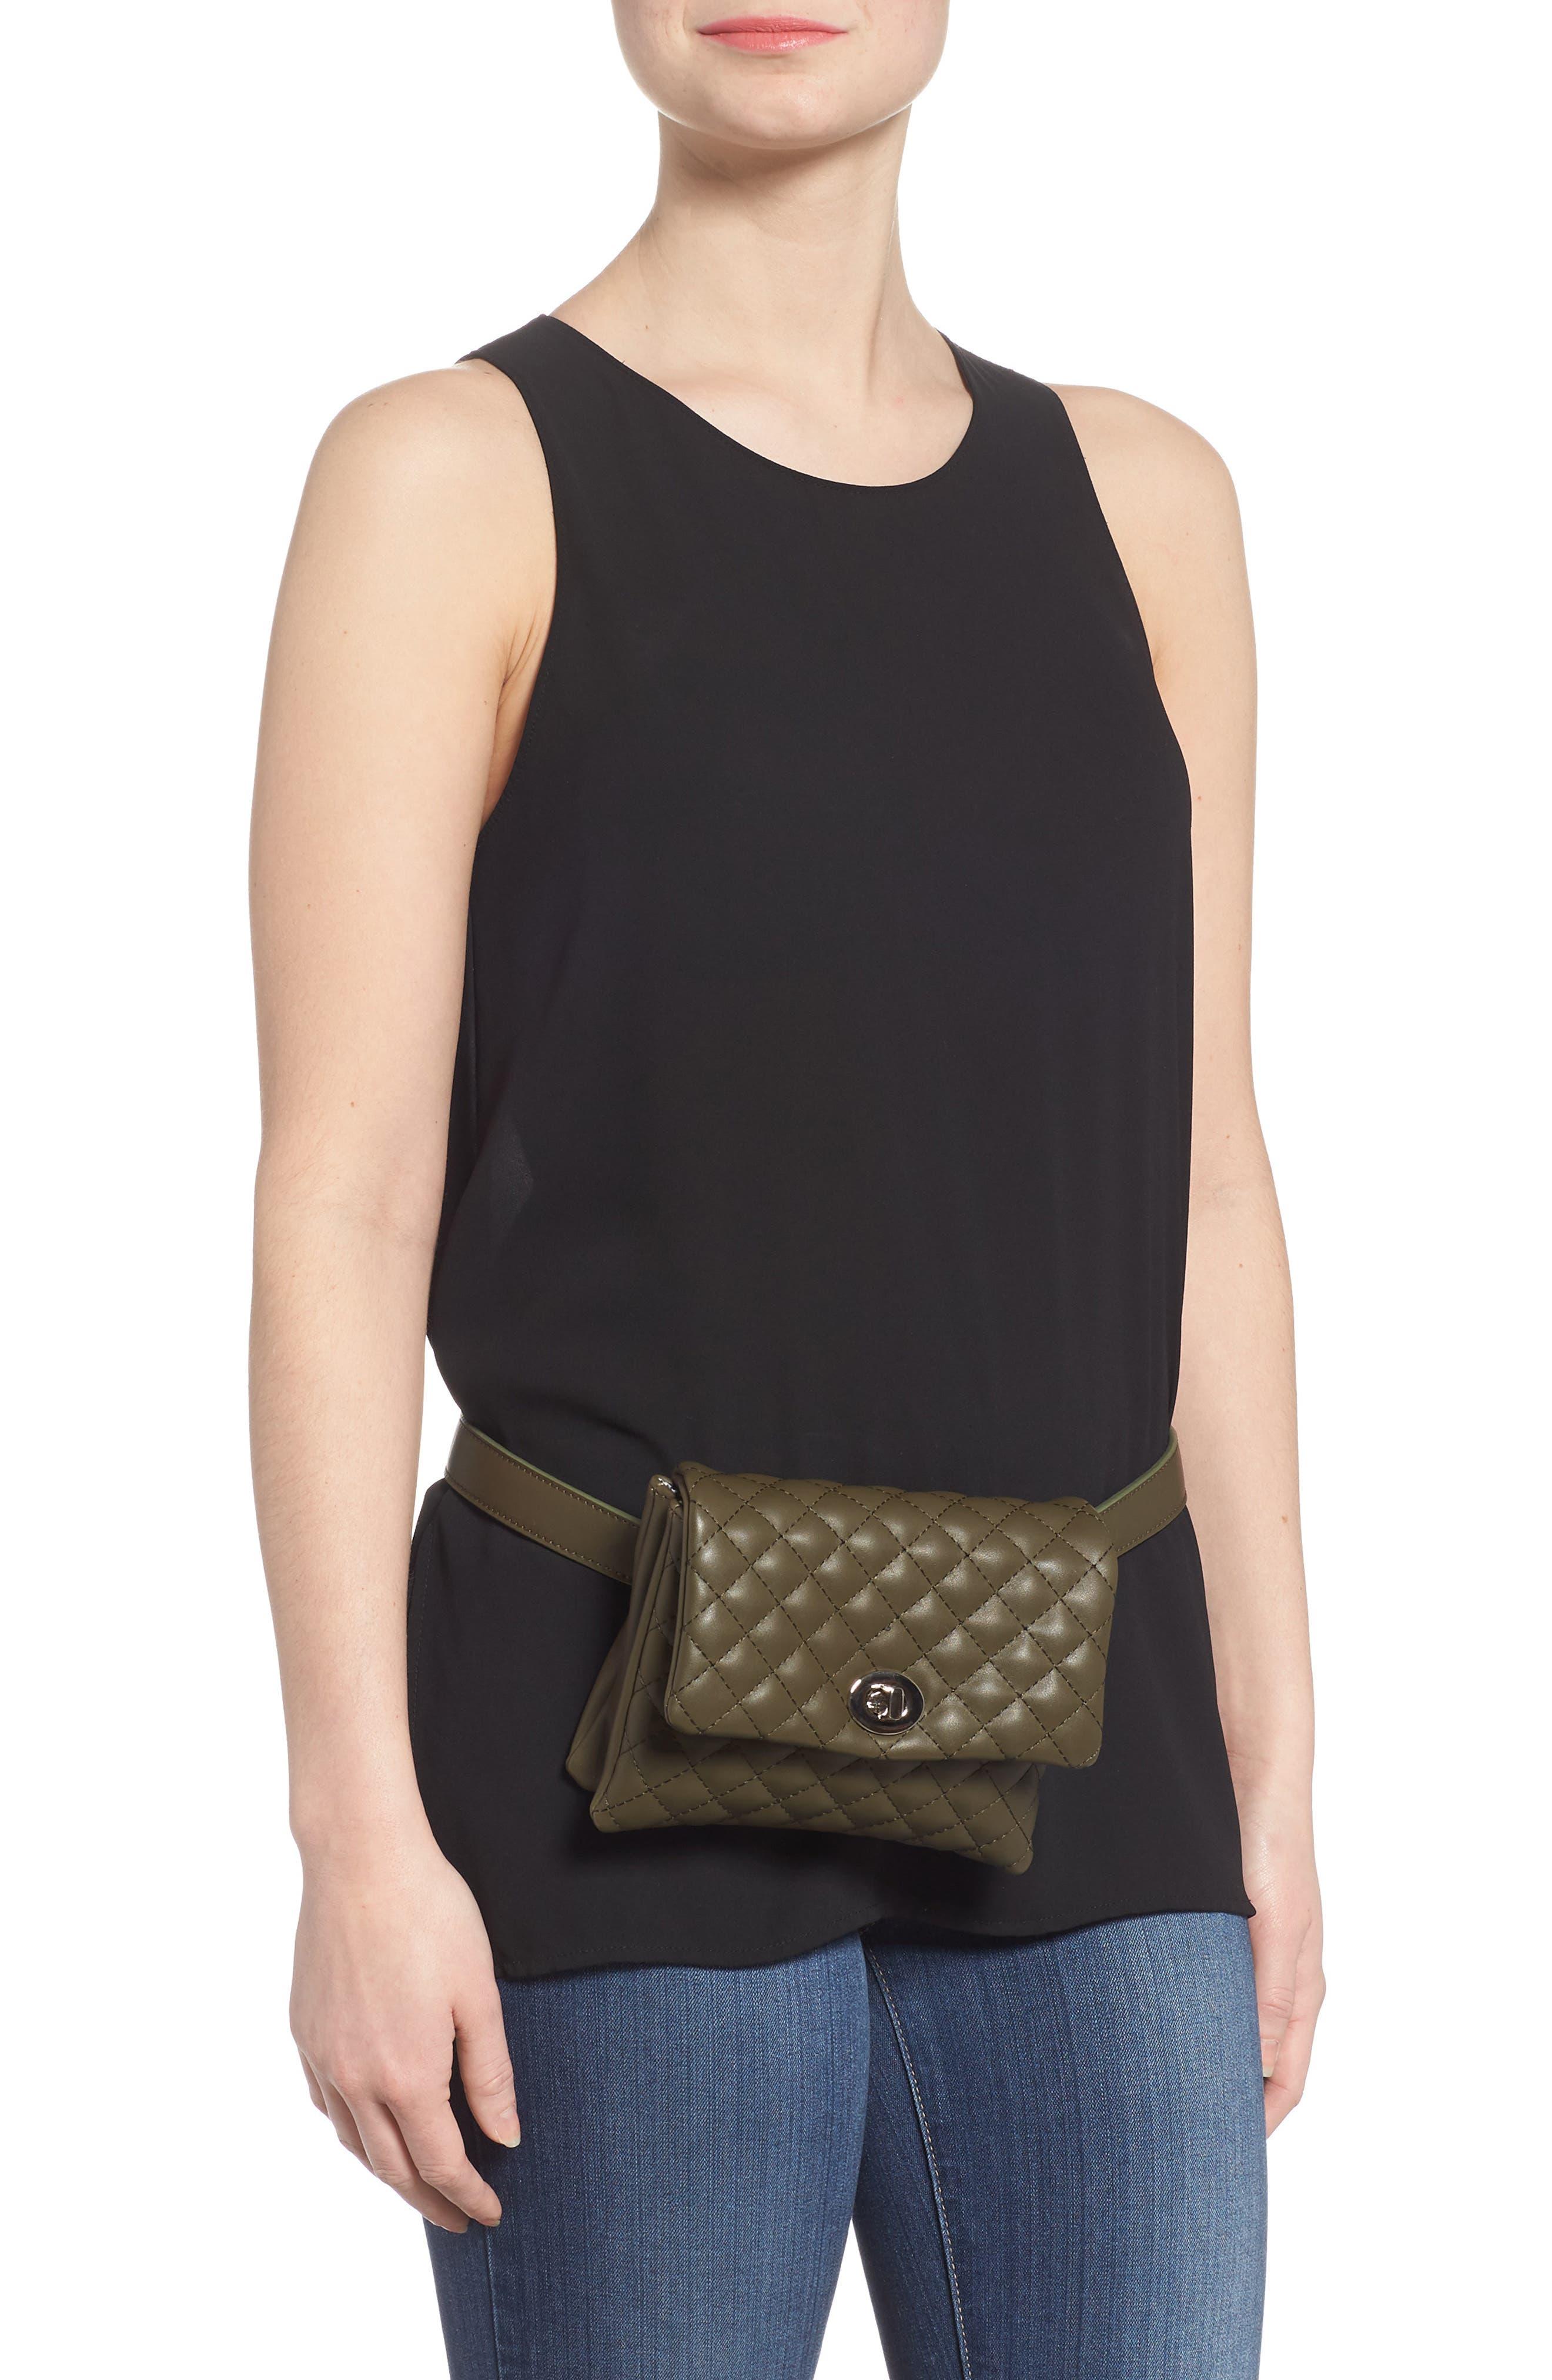 Mali + Lili Quilted Vegan Leather Convertible Belt Bag,                             Alternate thumbnail 2, color,                             OLIVE